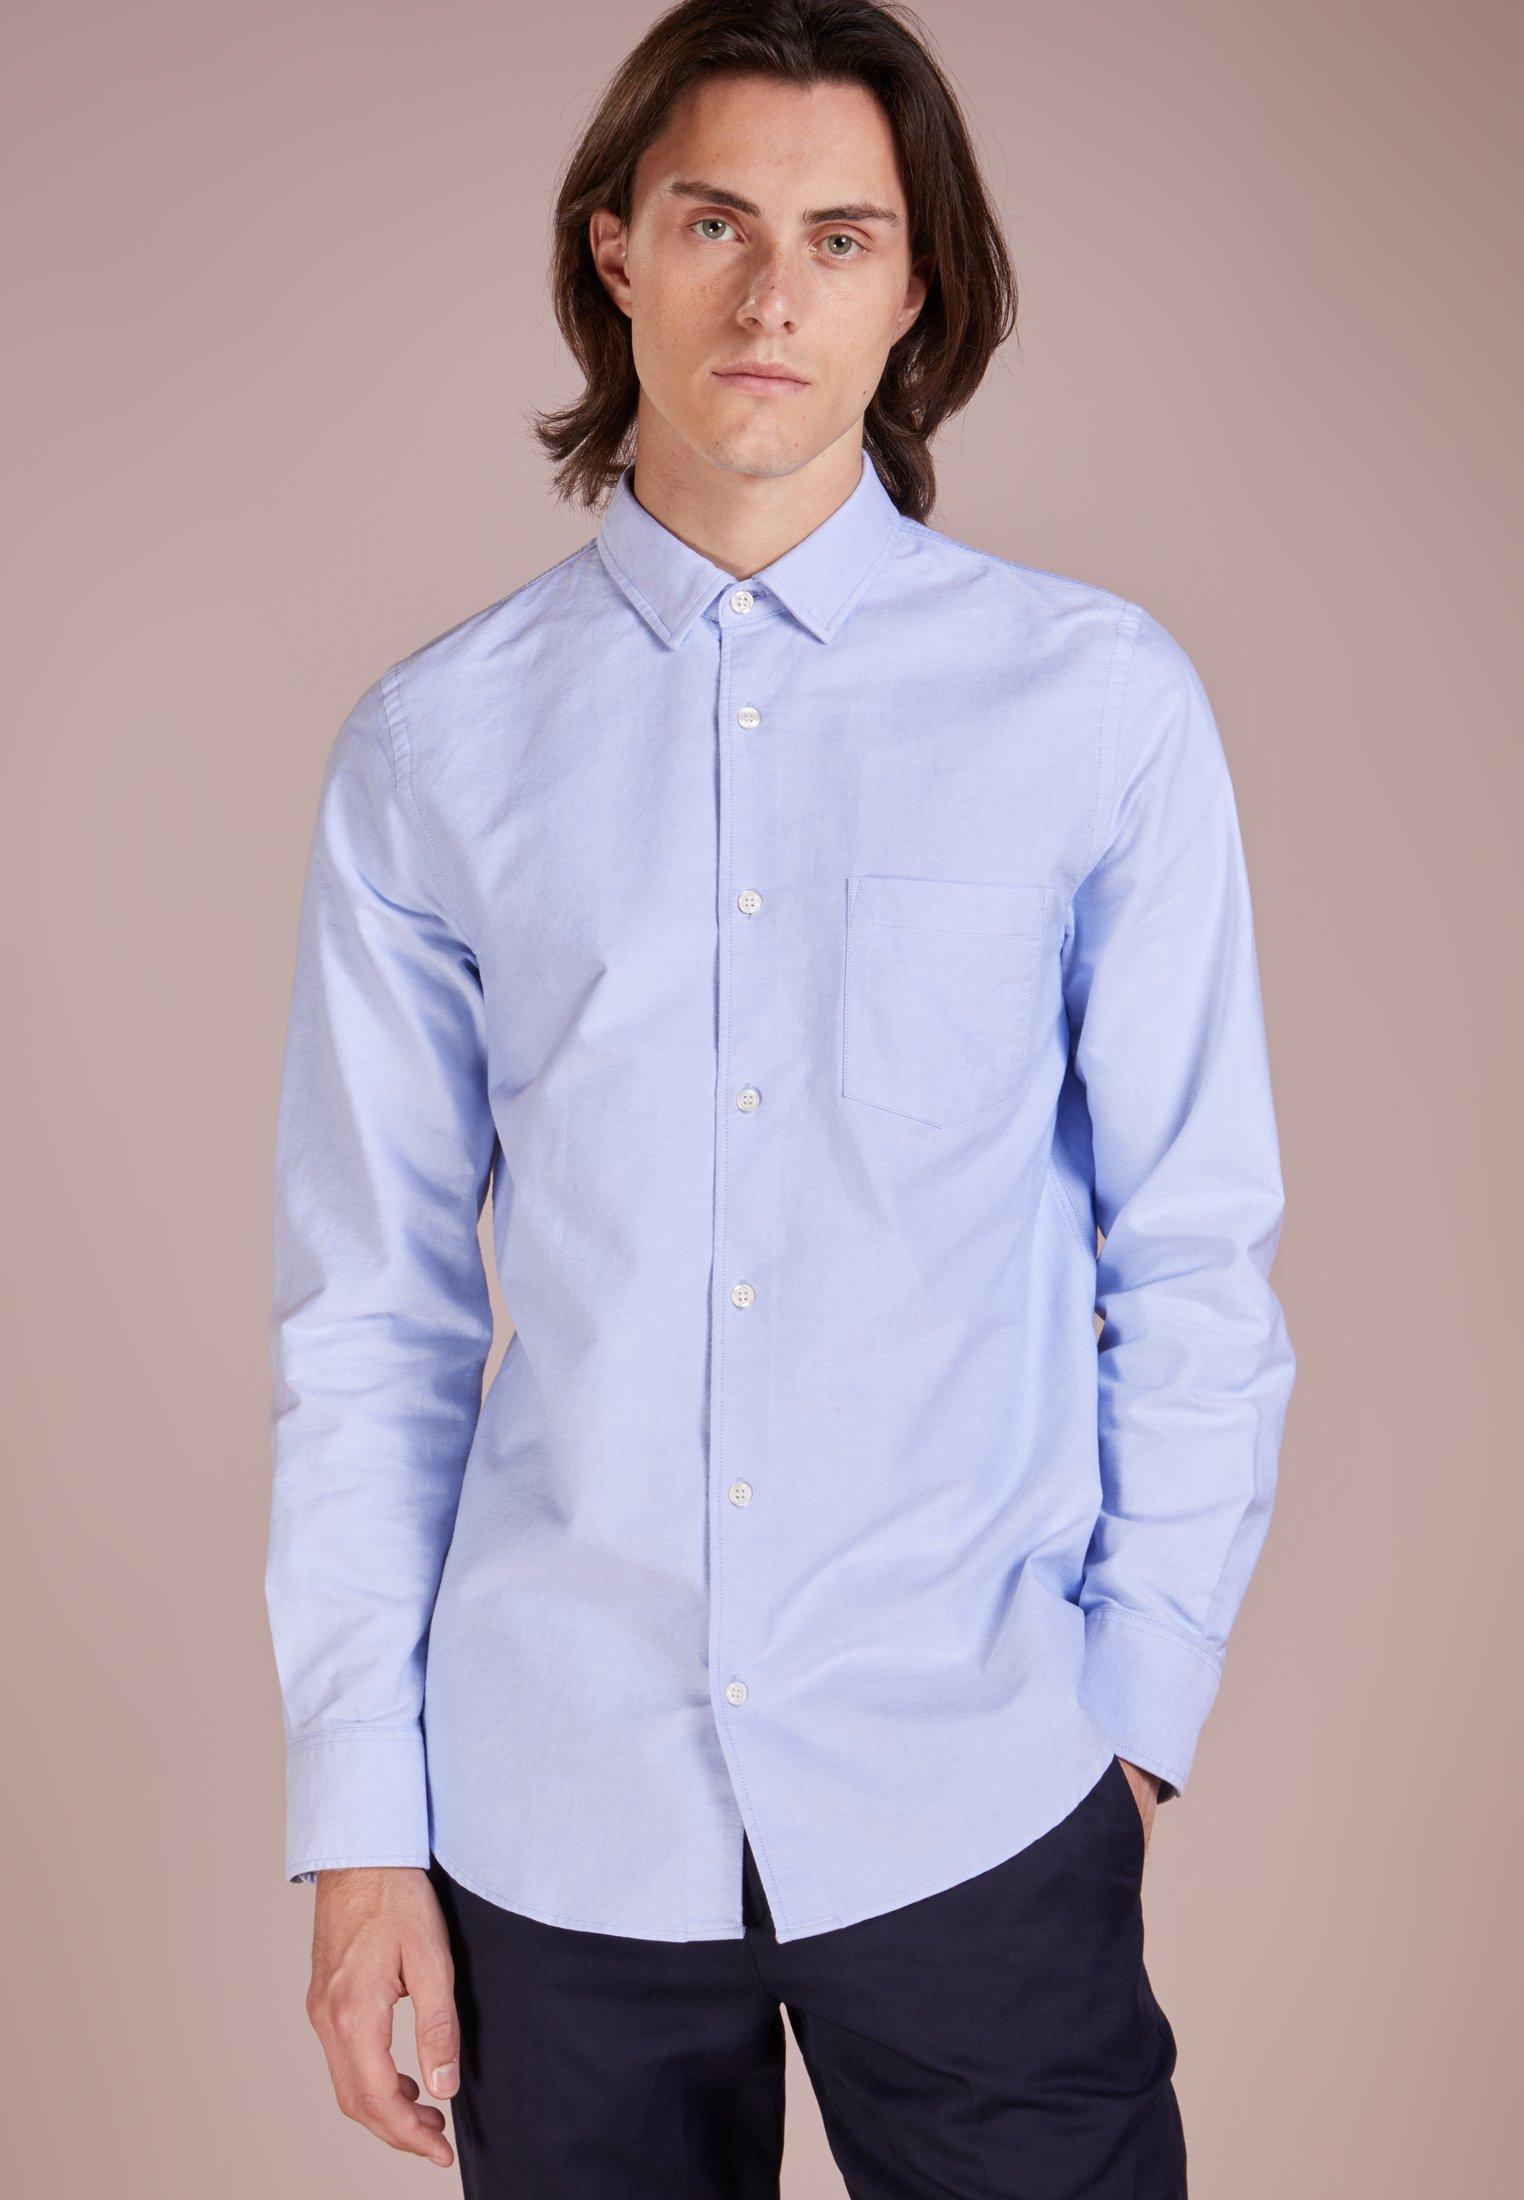 Filippa K TIM OXFORD SHIRT Skjorte light bluelyseblå